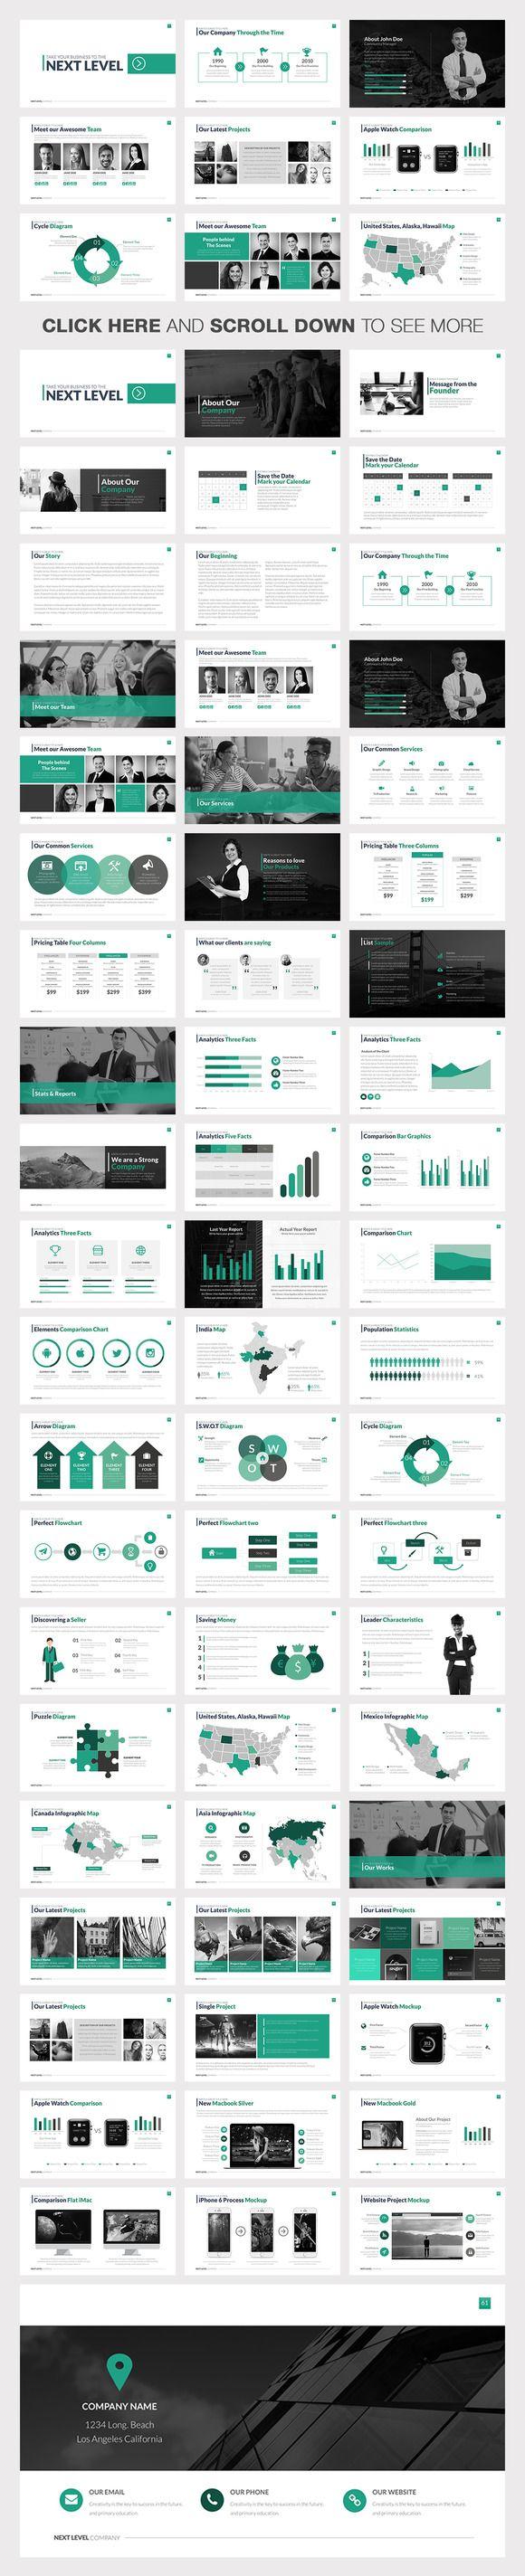 Next Level by Slidedizer (Creative Market)